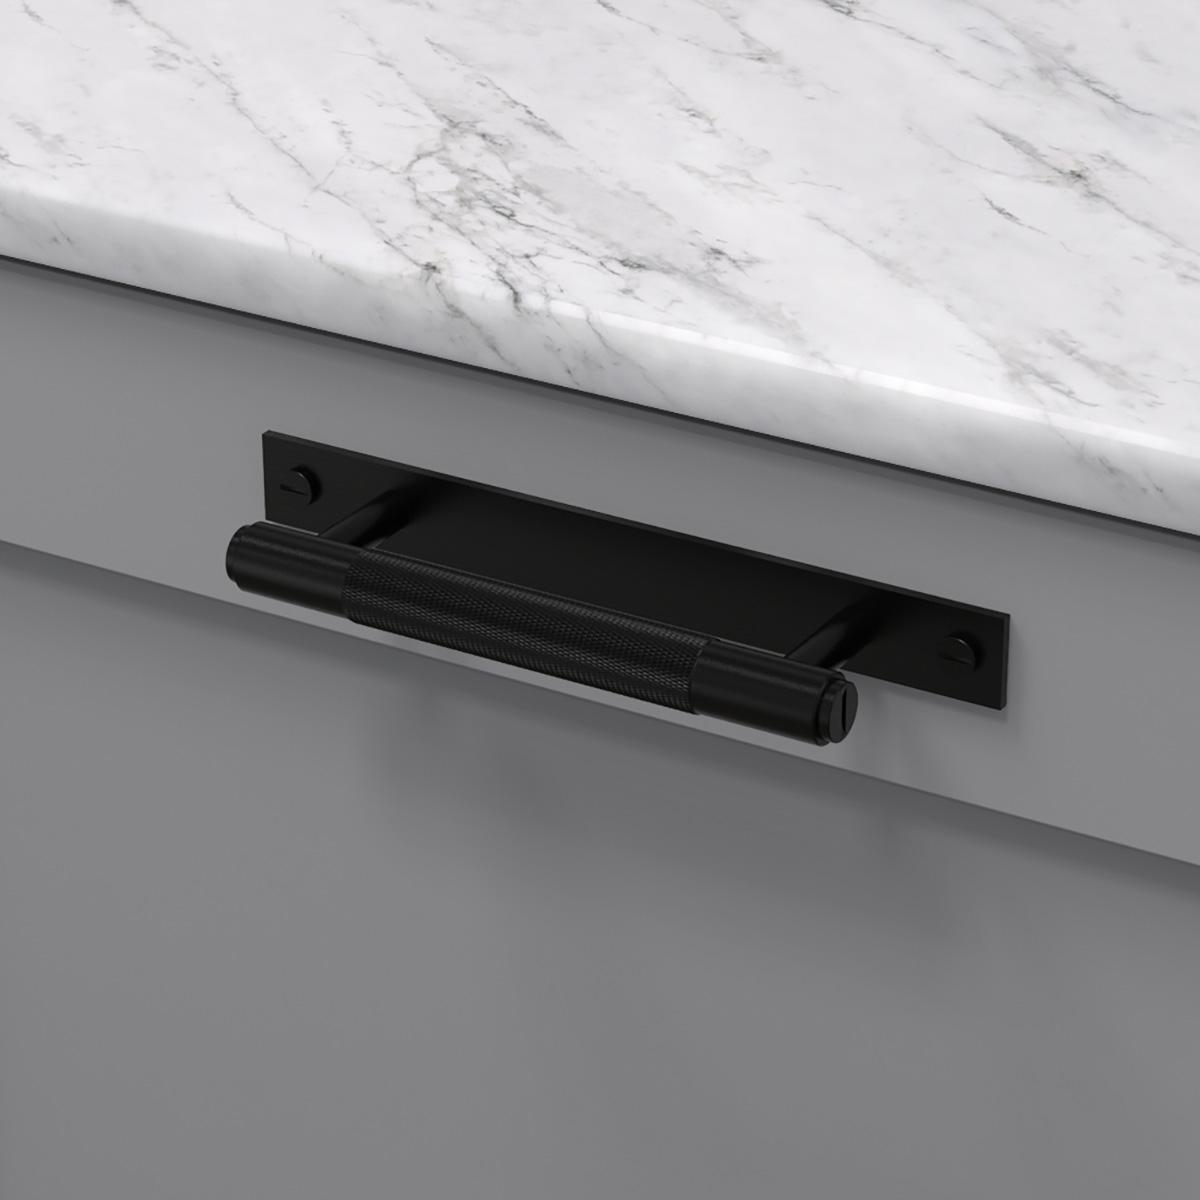 pull bar plate svart uk pb hp 160 bl a cc 125 mm ncs s 4500 n marmor carrara